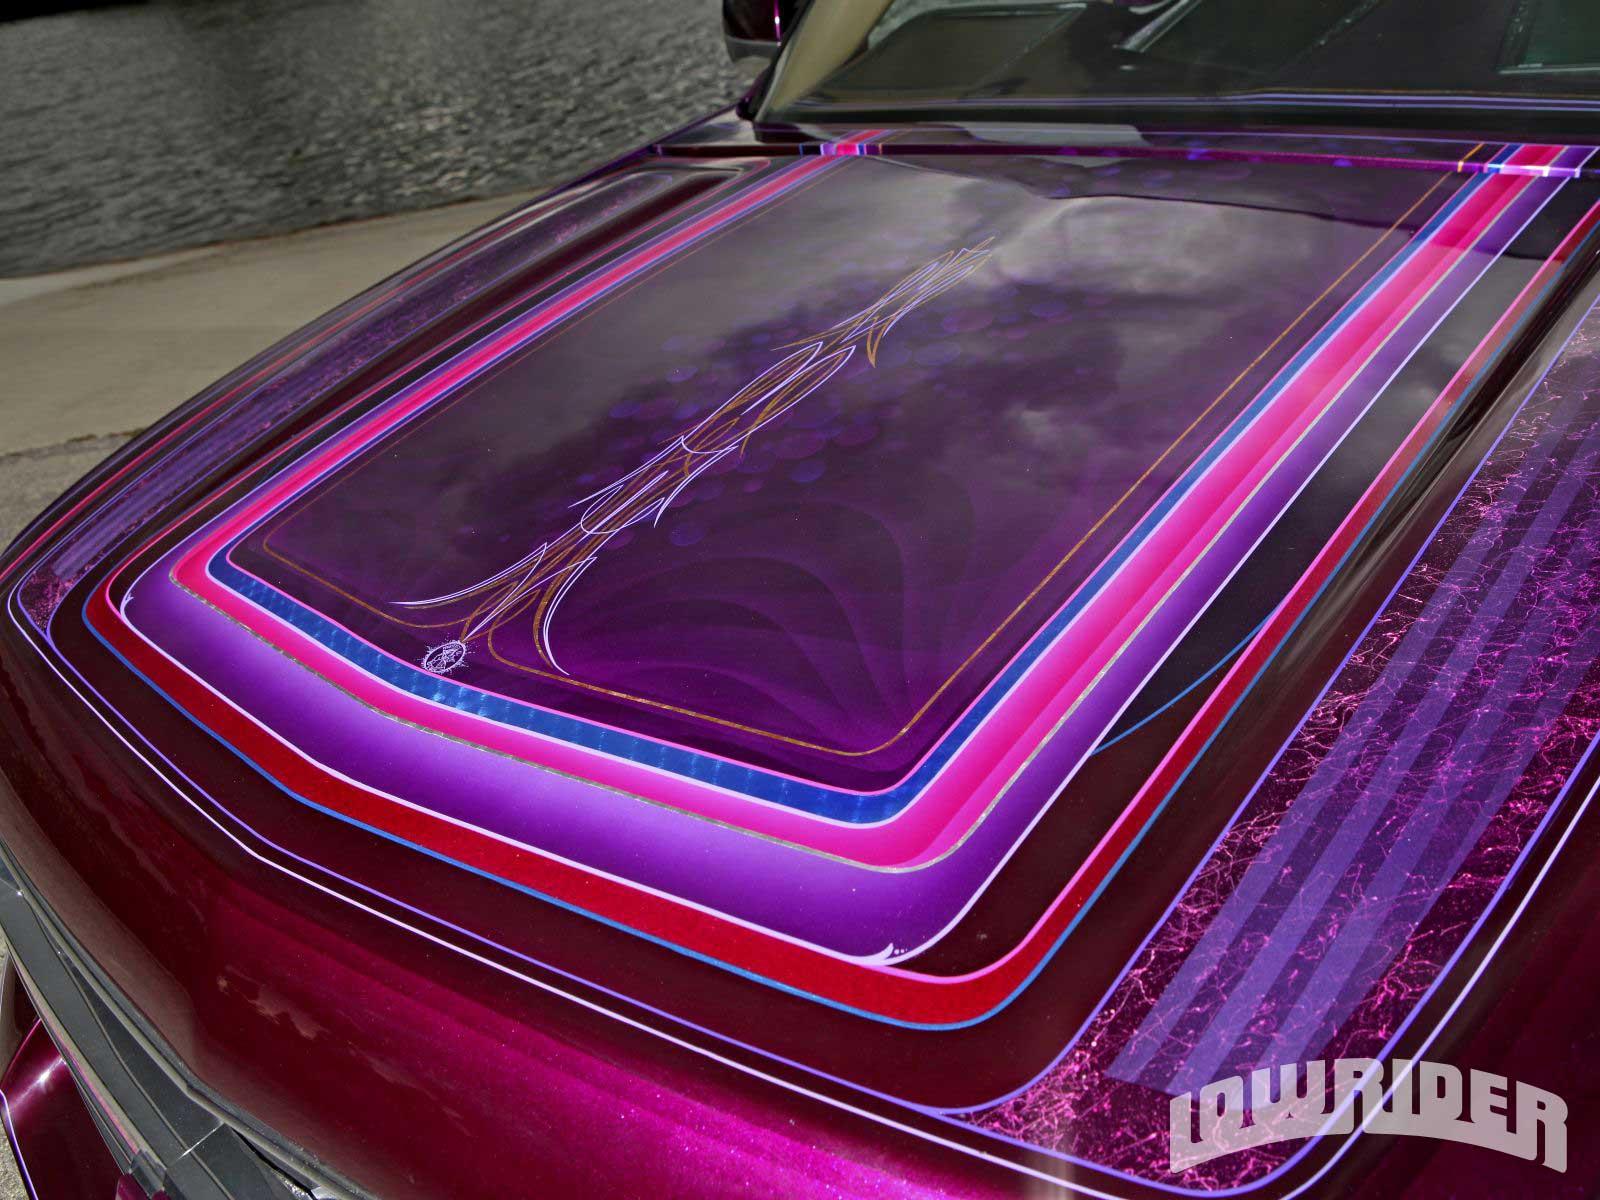 2004 Chevrolet Silverado - Lowrider Magazine